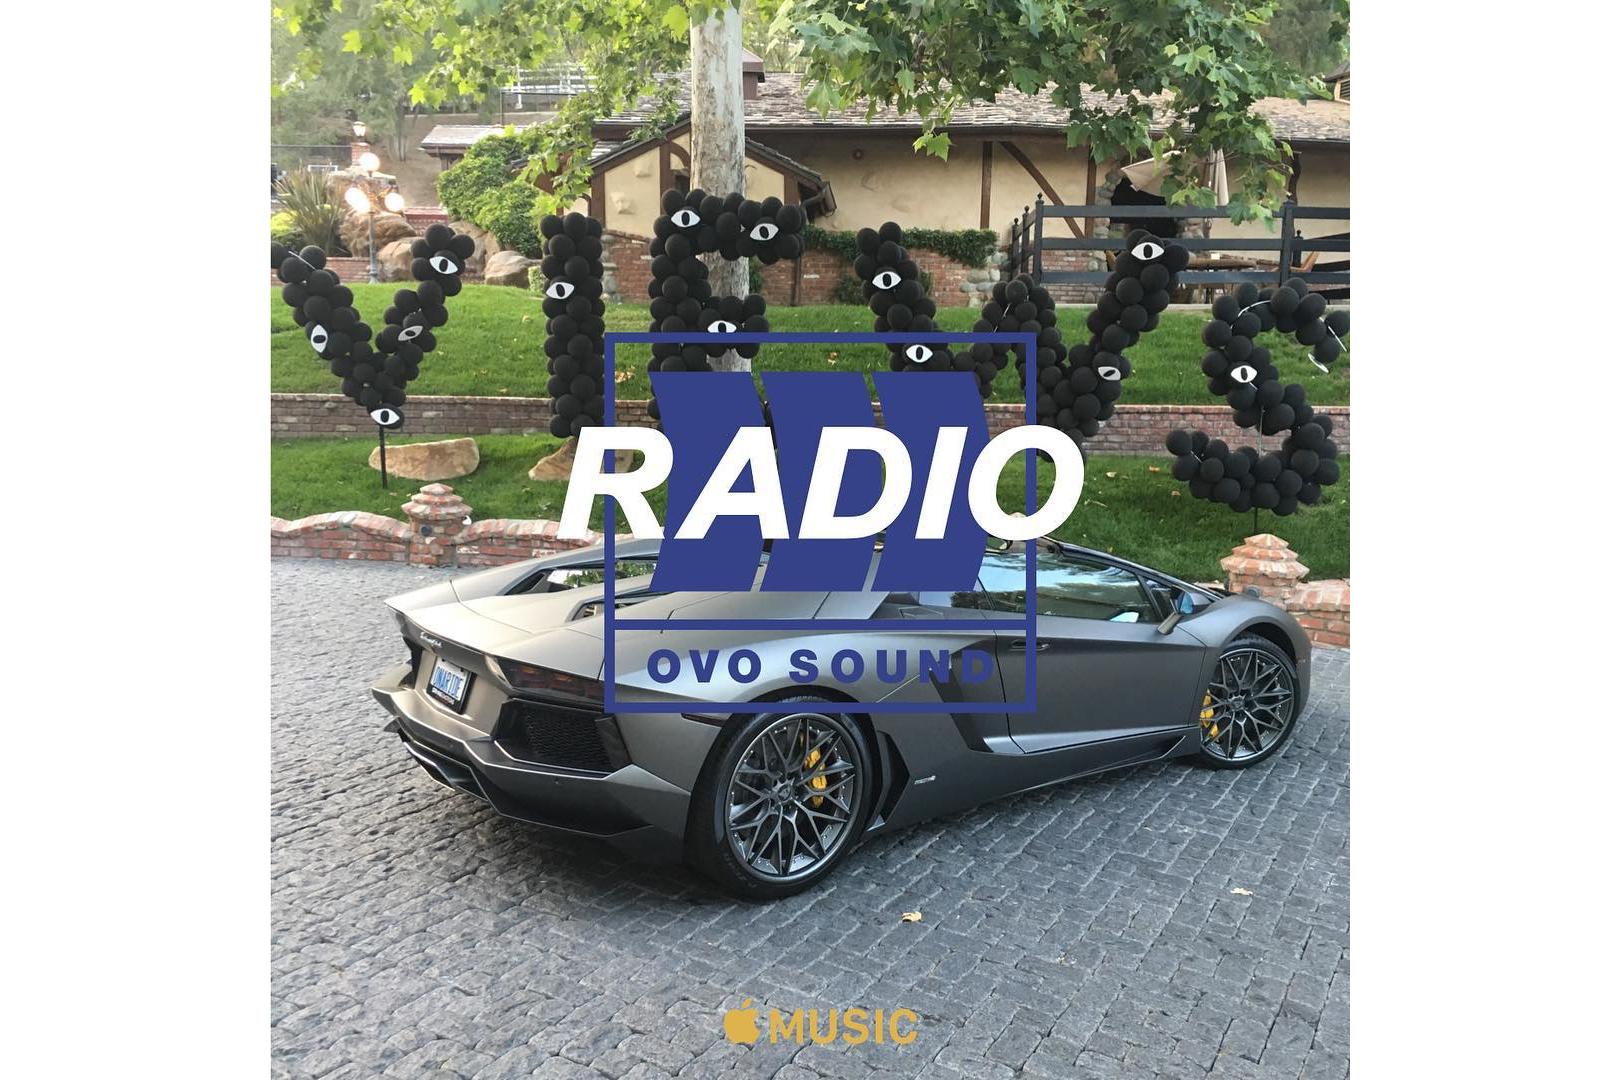 Drake to Guest DJ OVO Sound Radio's 23rd Episode